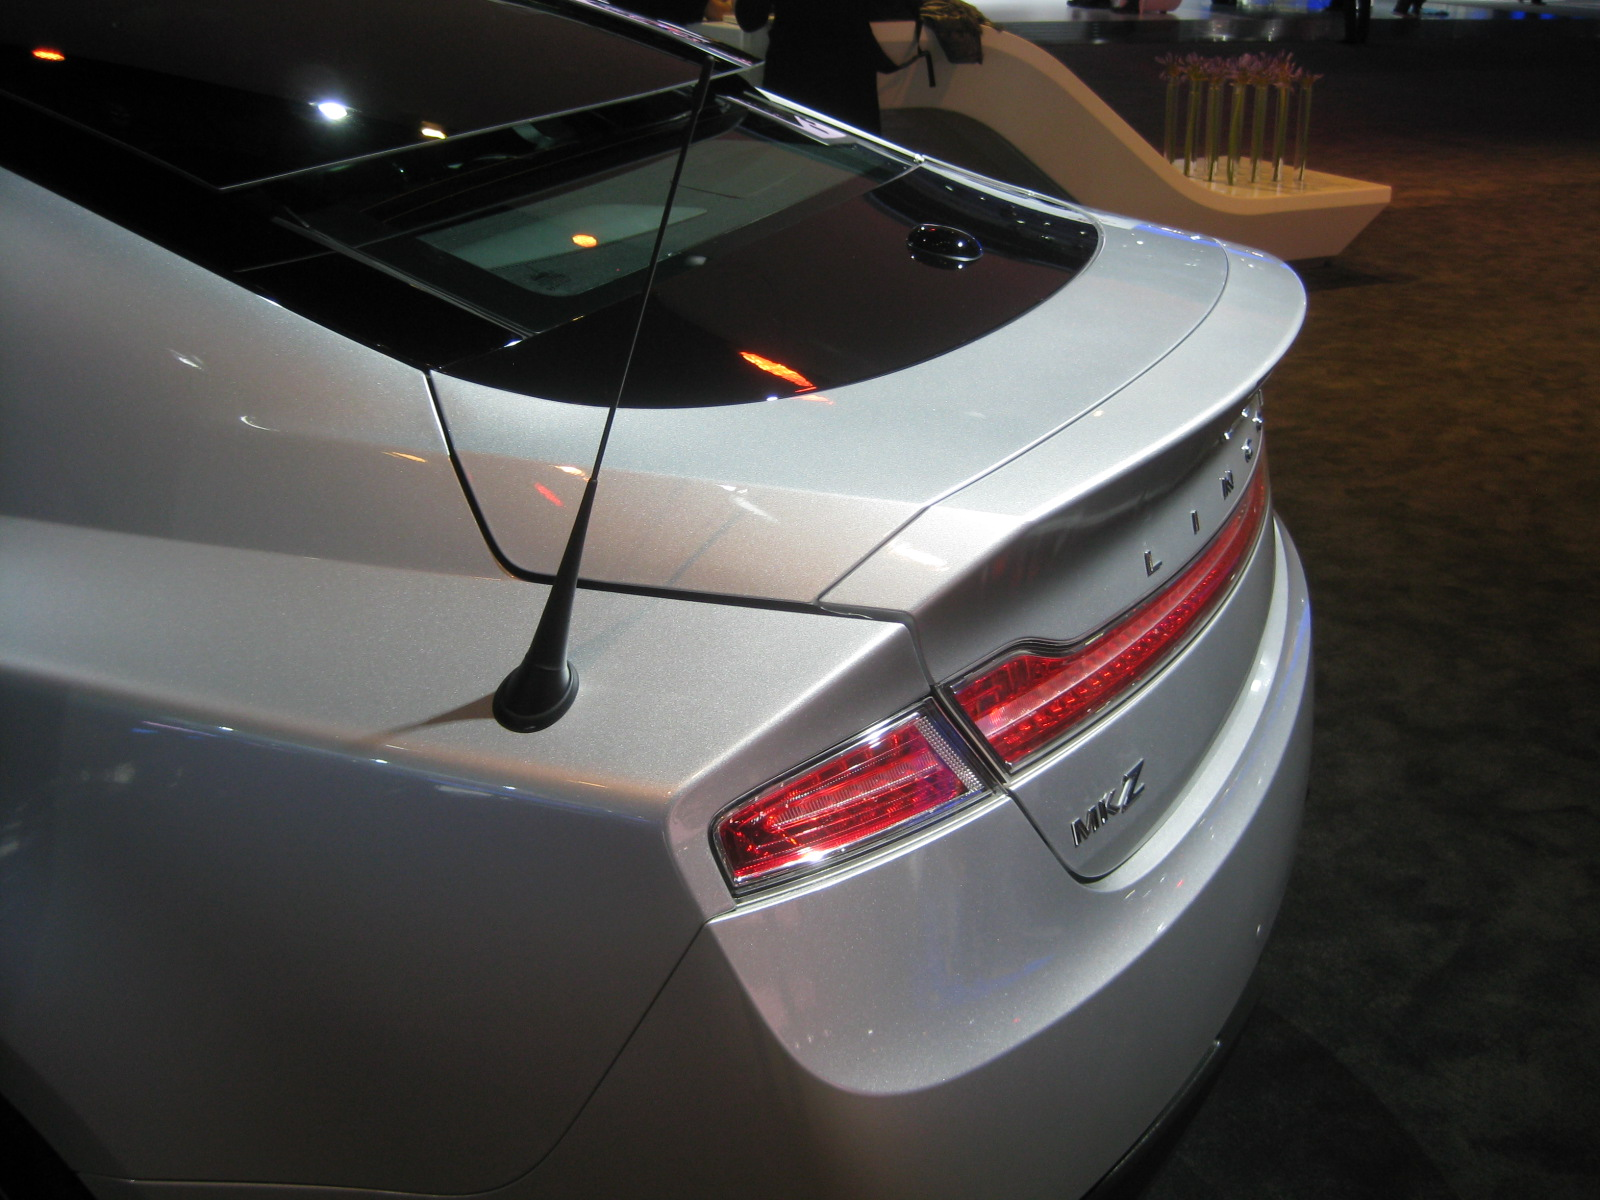 Lincoln 2013 Mkz Rear Detail Antenna Todd Bianco S